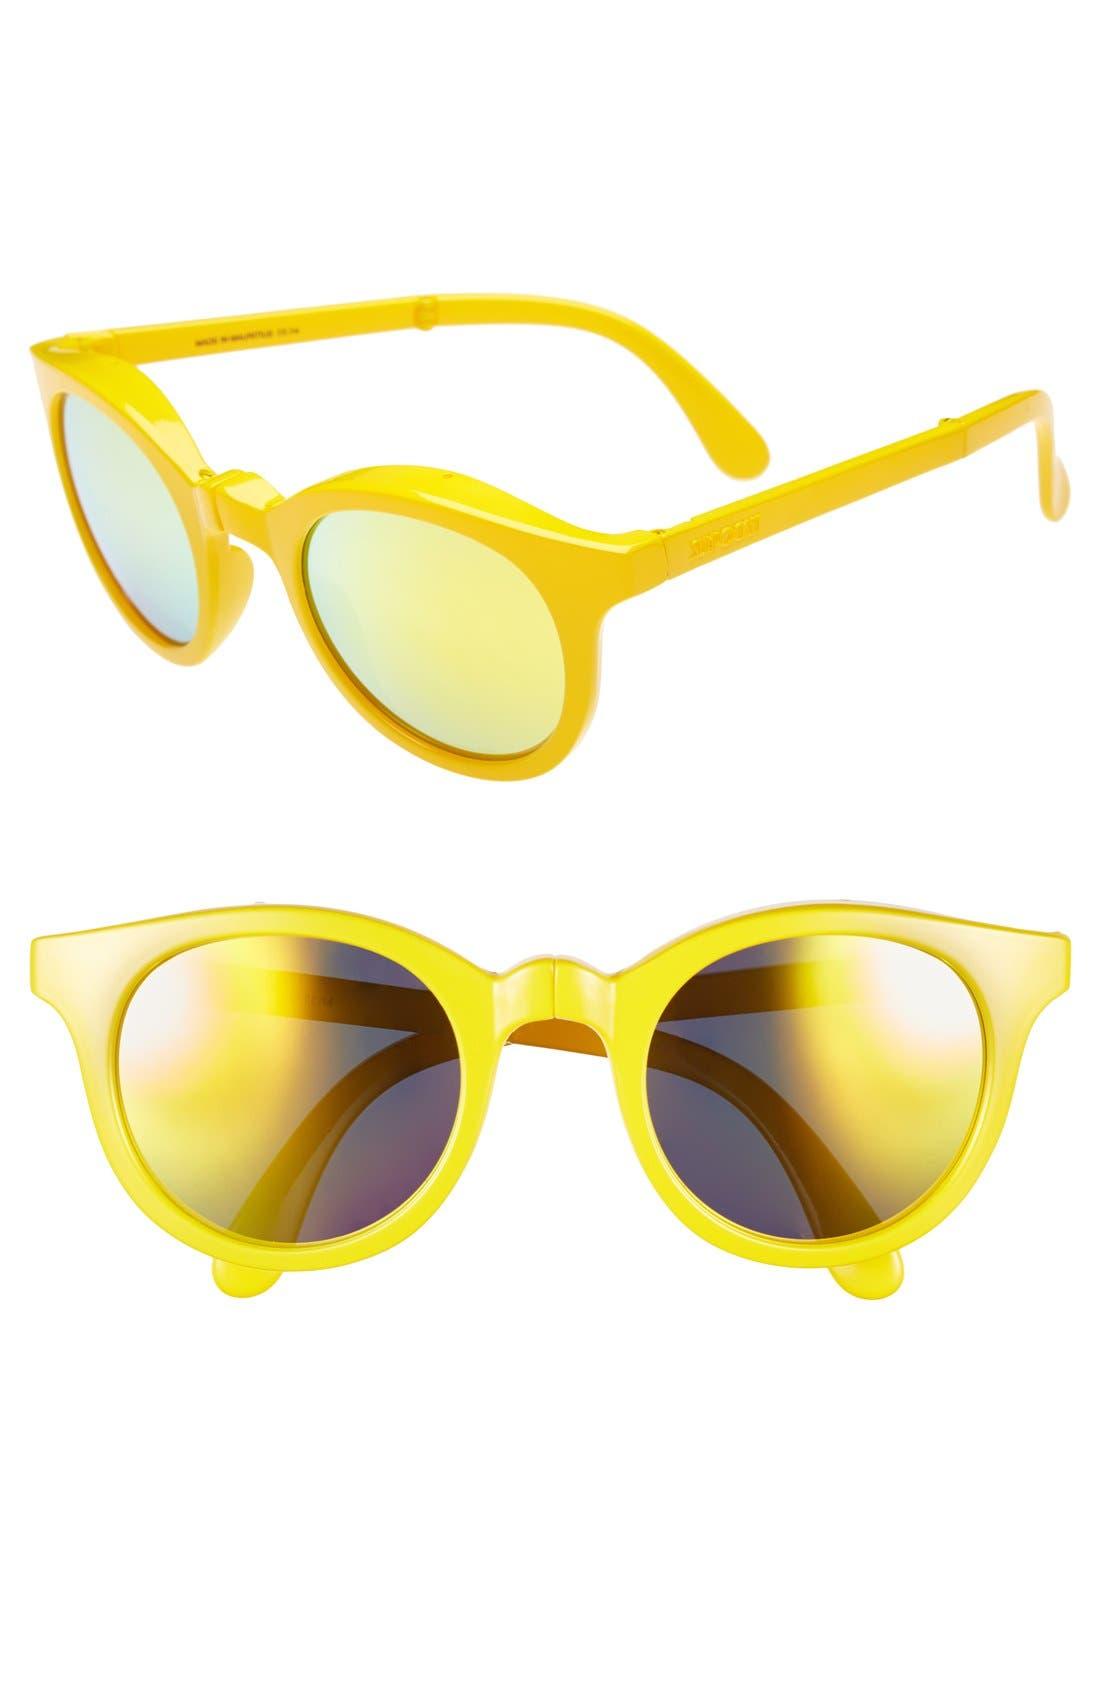 Alternate Image 1 Selected - Sunpocket 'Samoa' 50mm Foldable Sunglasses